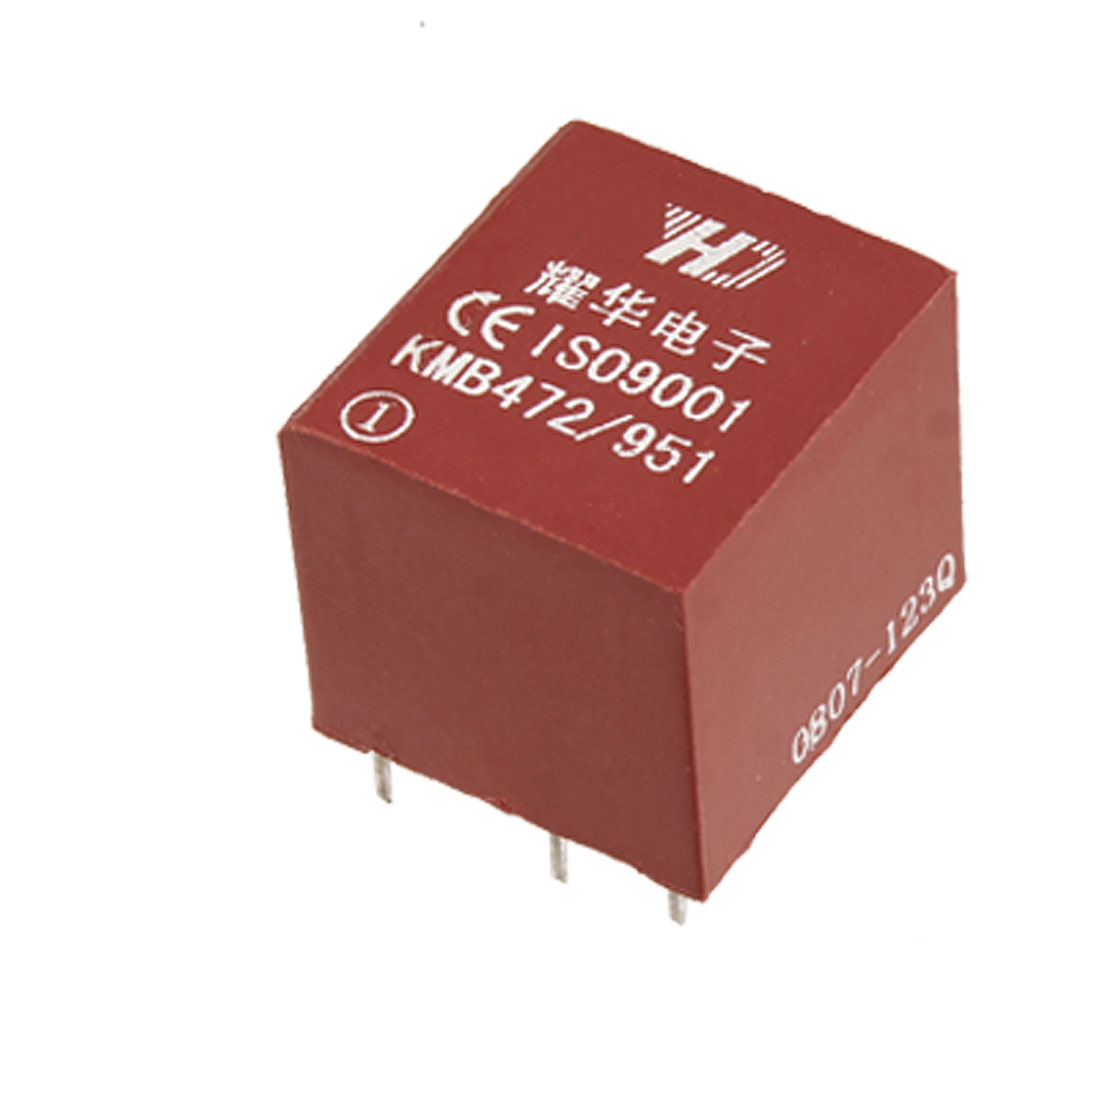 1-10KHz Frequency PCB Mount Thyristors Trigger Pulse Transformer KMB472/951